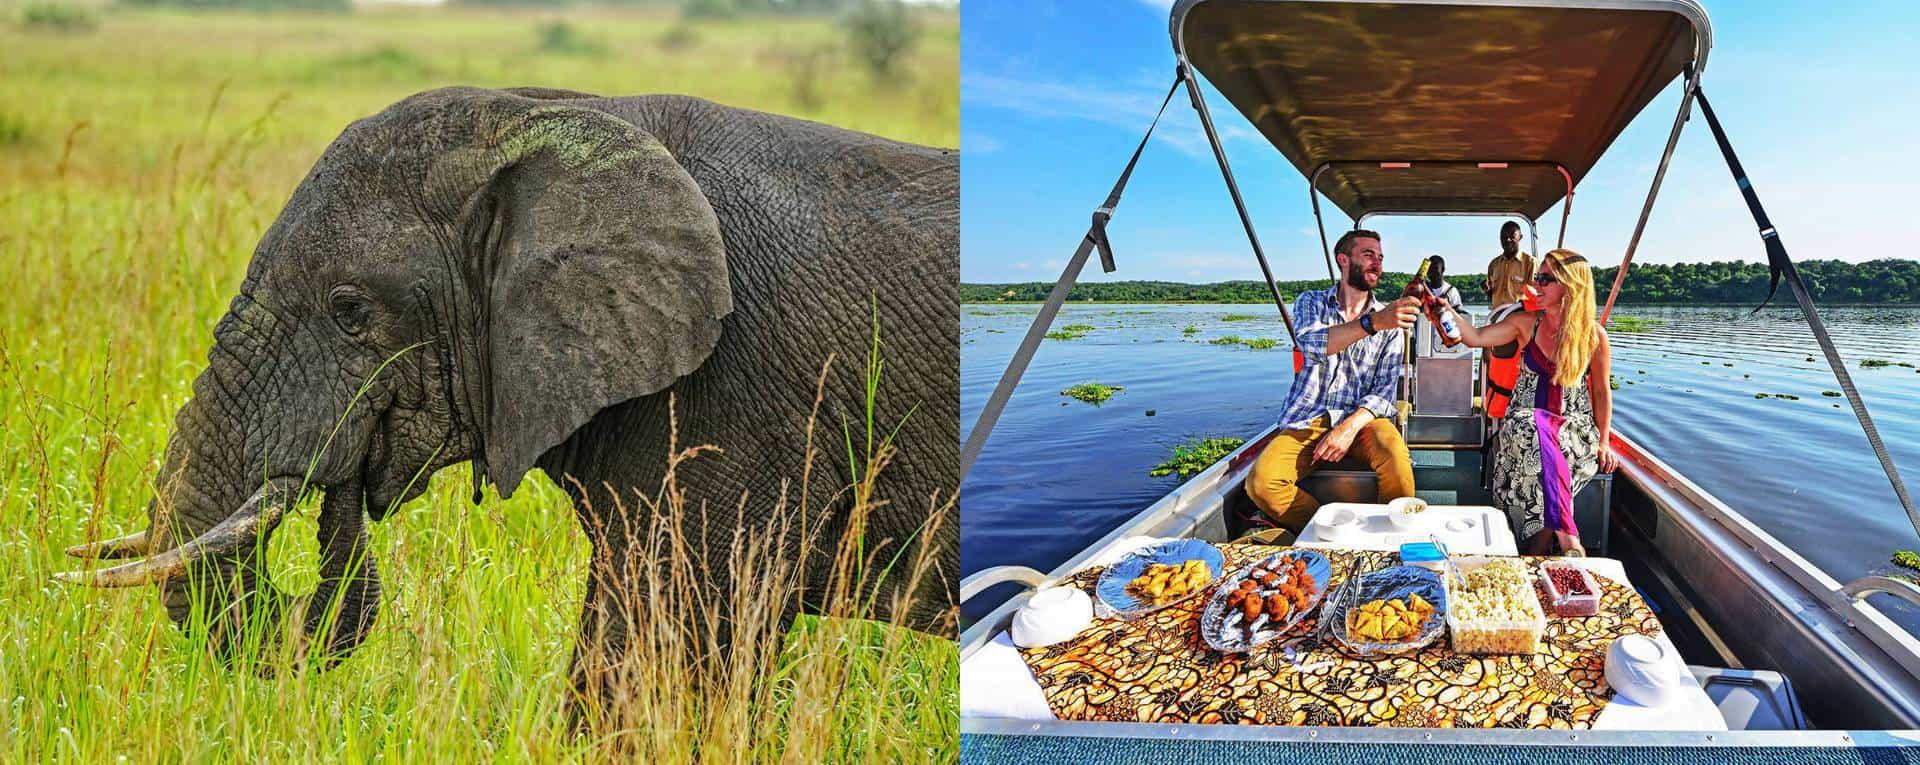 Honeymoon Safaris Trip Planning Guide For Uganda